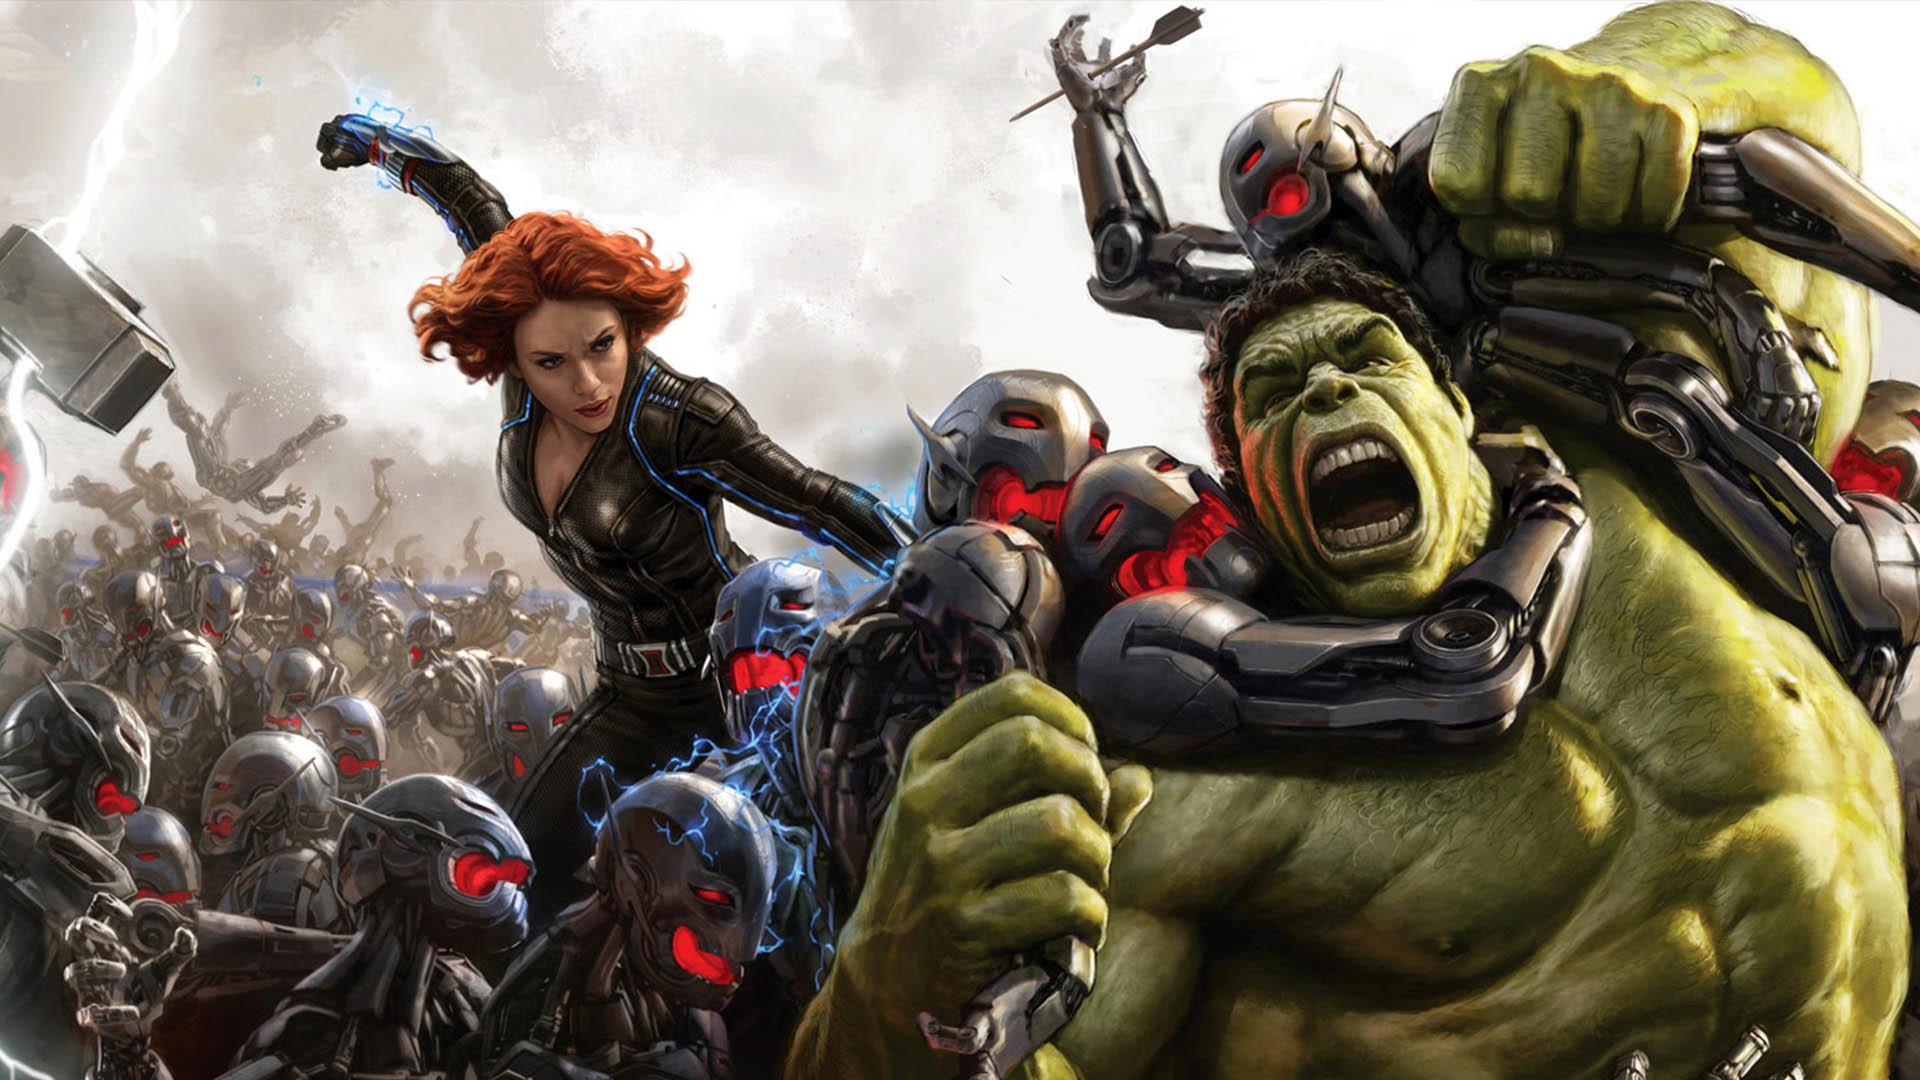 Avengers: Age of Ultron Concept Art Close-up wallpaper